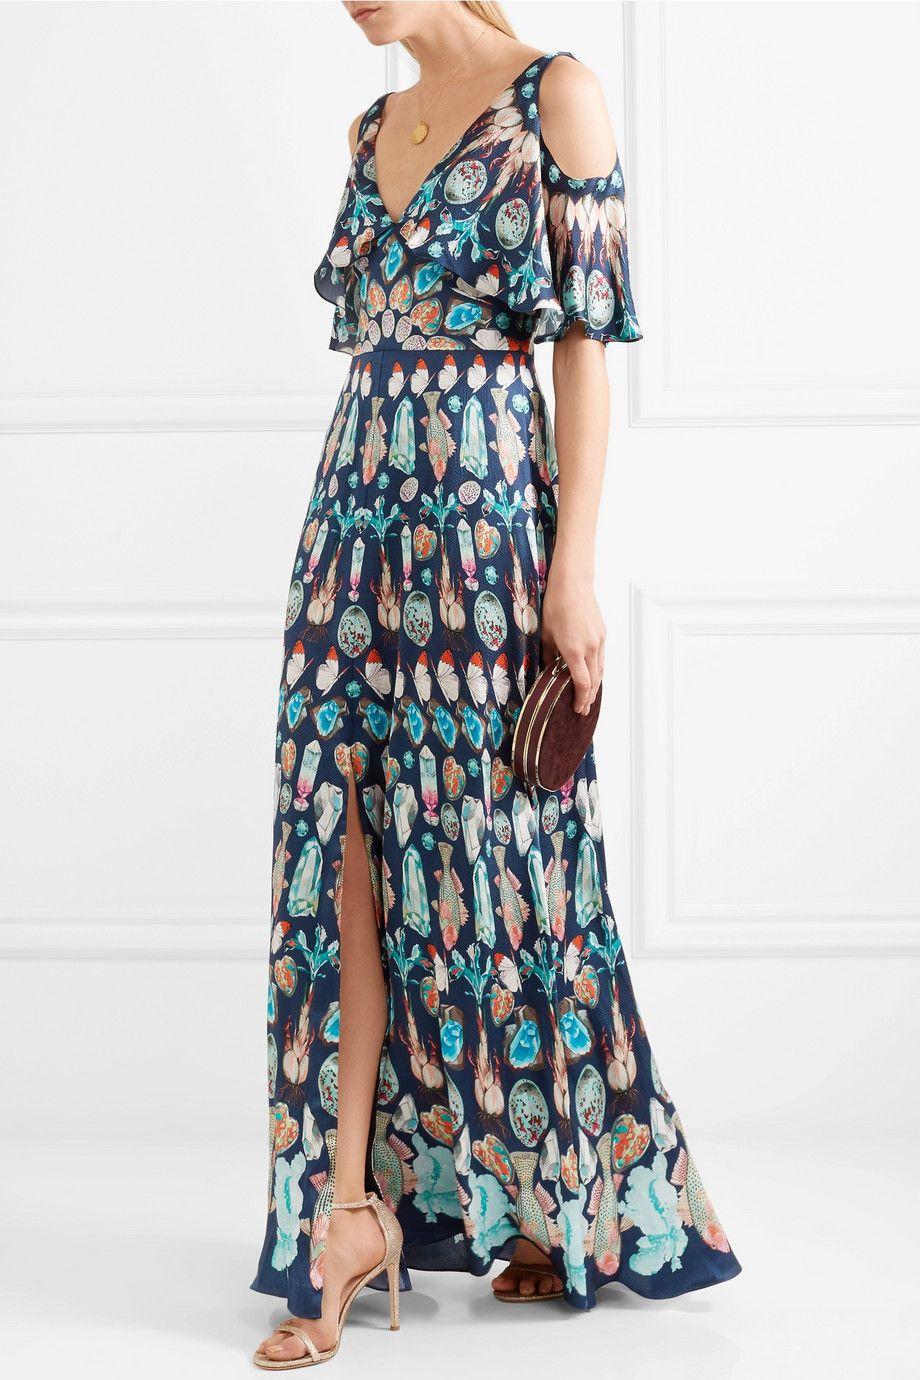 Quartz Cold-shoulder Printed Silk Crepe De Chine Gown - Blue Temperley London in24Y7aM